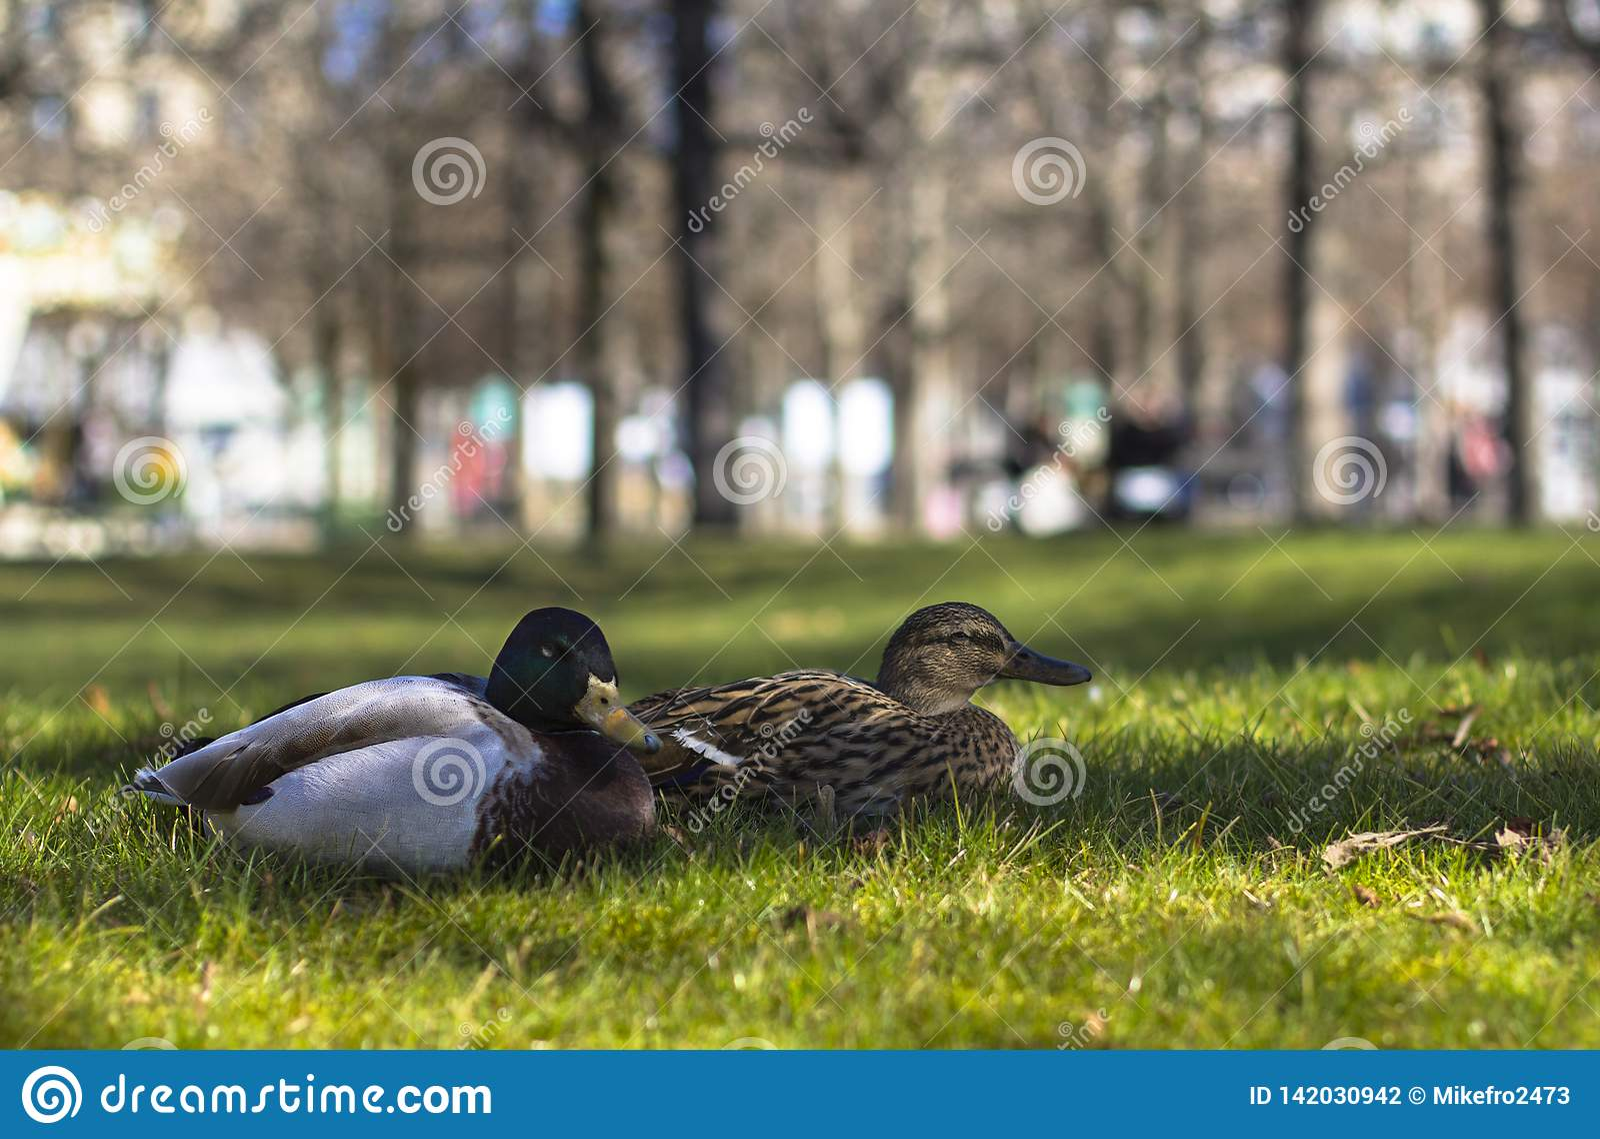 Pato dois no lown verde no parque